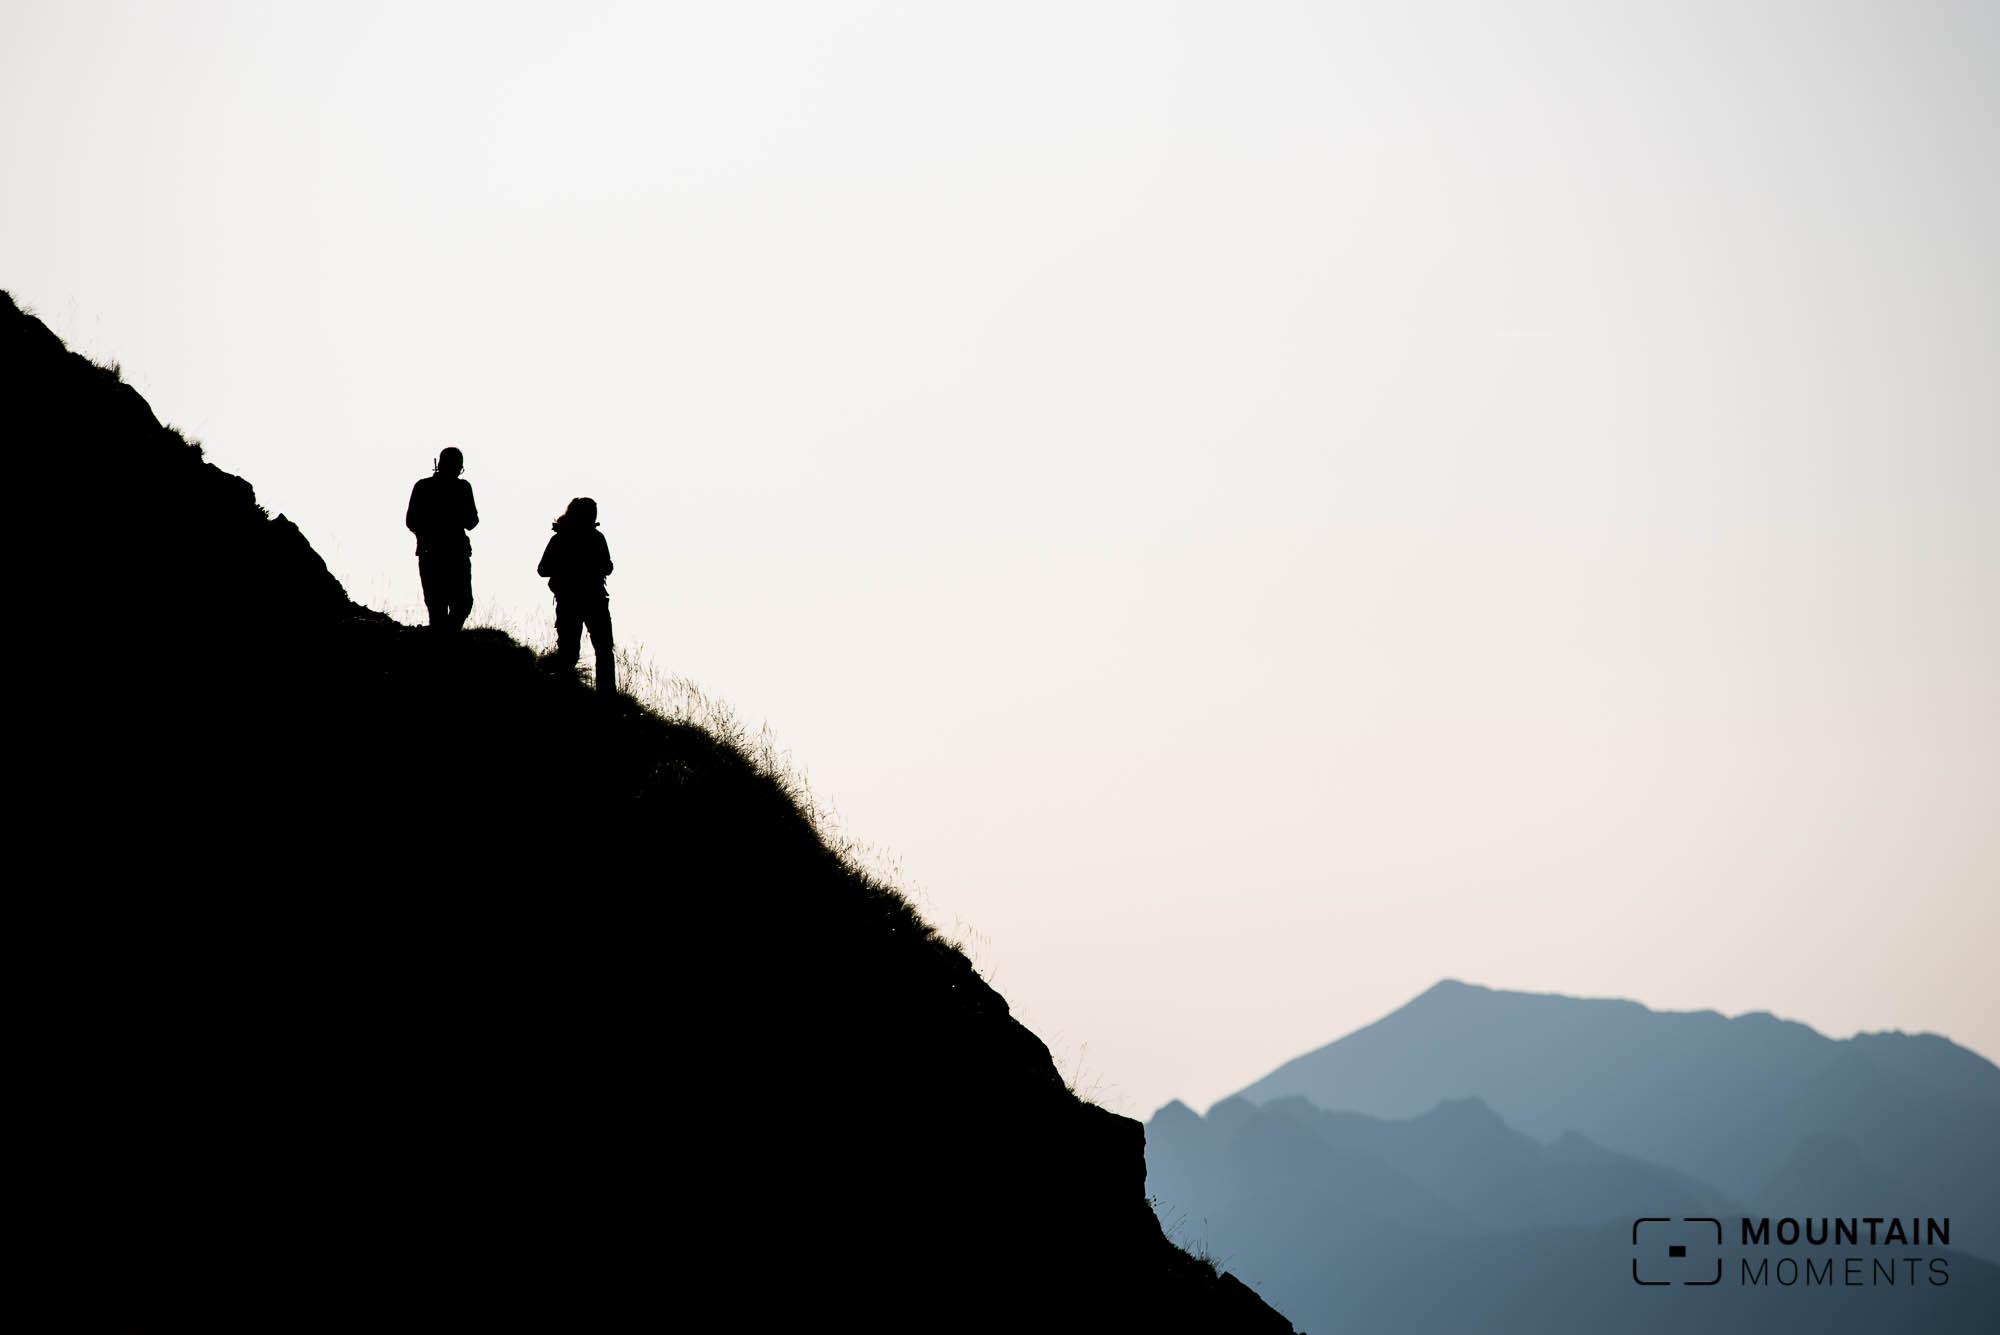 abenteuer hüttenübernachtung, foto workshop, foto alpen, fotoworkshop alpen, fotoworkshop berge, abenteuer alpinwandern, bergwandern, adventure, hiking alps, tirol, kellerjochhütte, zillertal, erste ferienregion zillertal, nationalpark karwendel, foto workshop karwendel, foto workshop zillertal, kellerjoch, gilfert